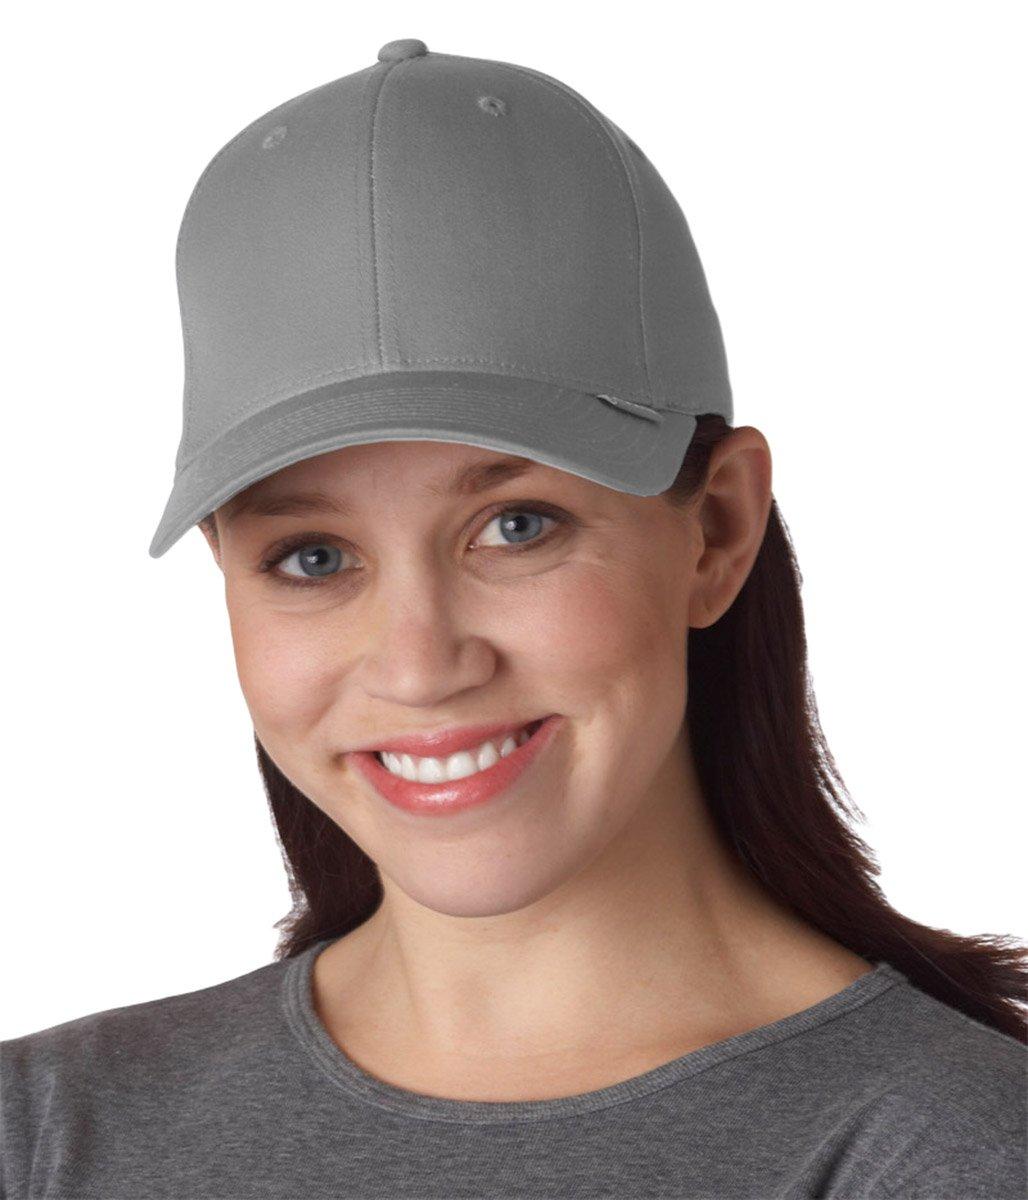 2-Pack Premium Original Flexfit V-Flexfit Cotton Twill Fitted Hat 5001